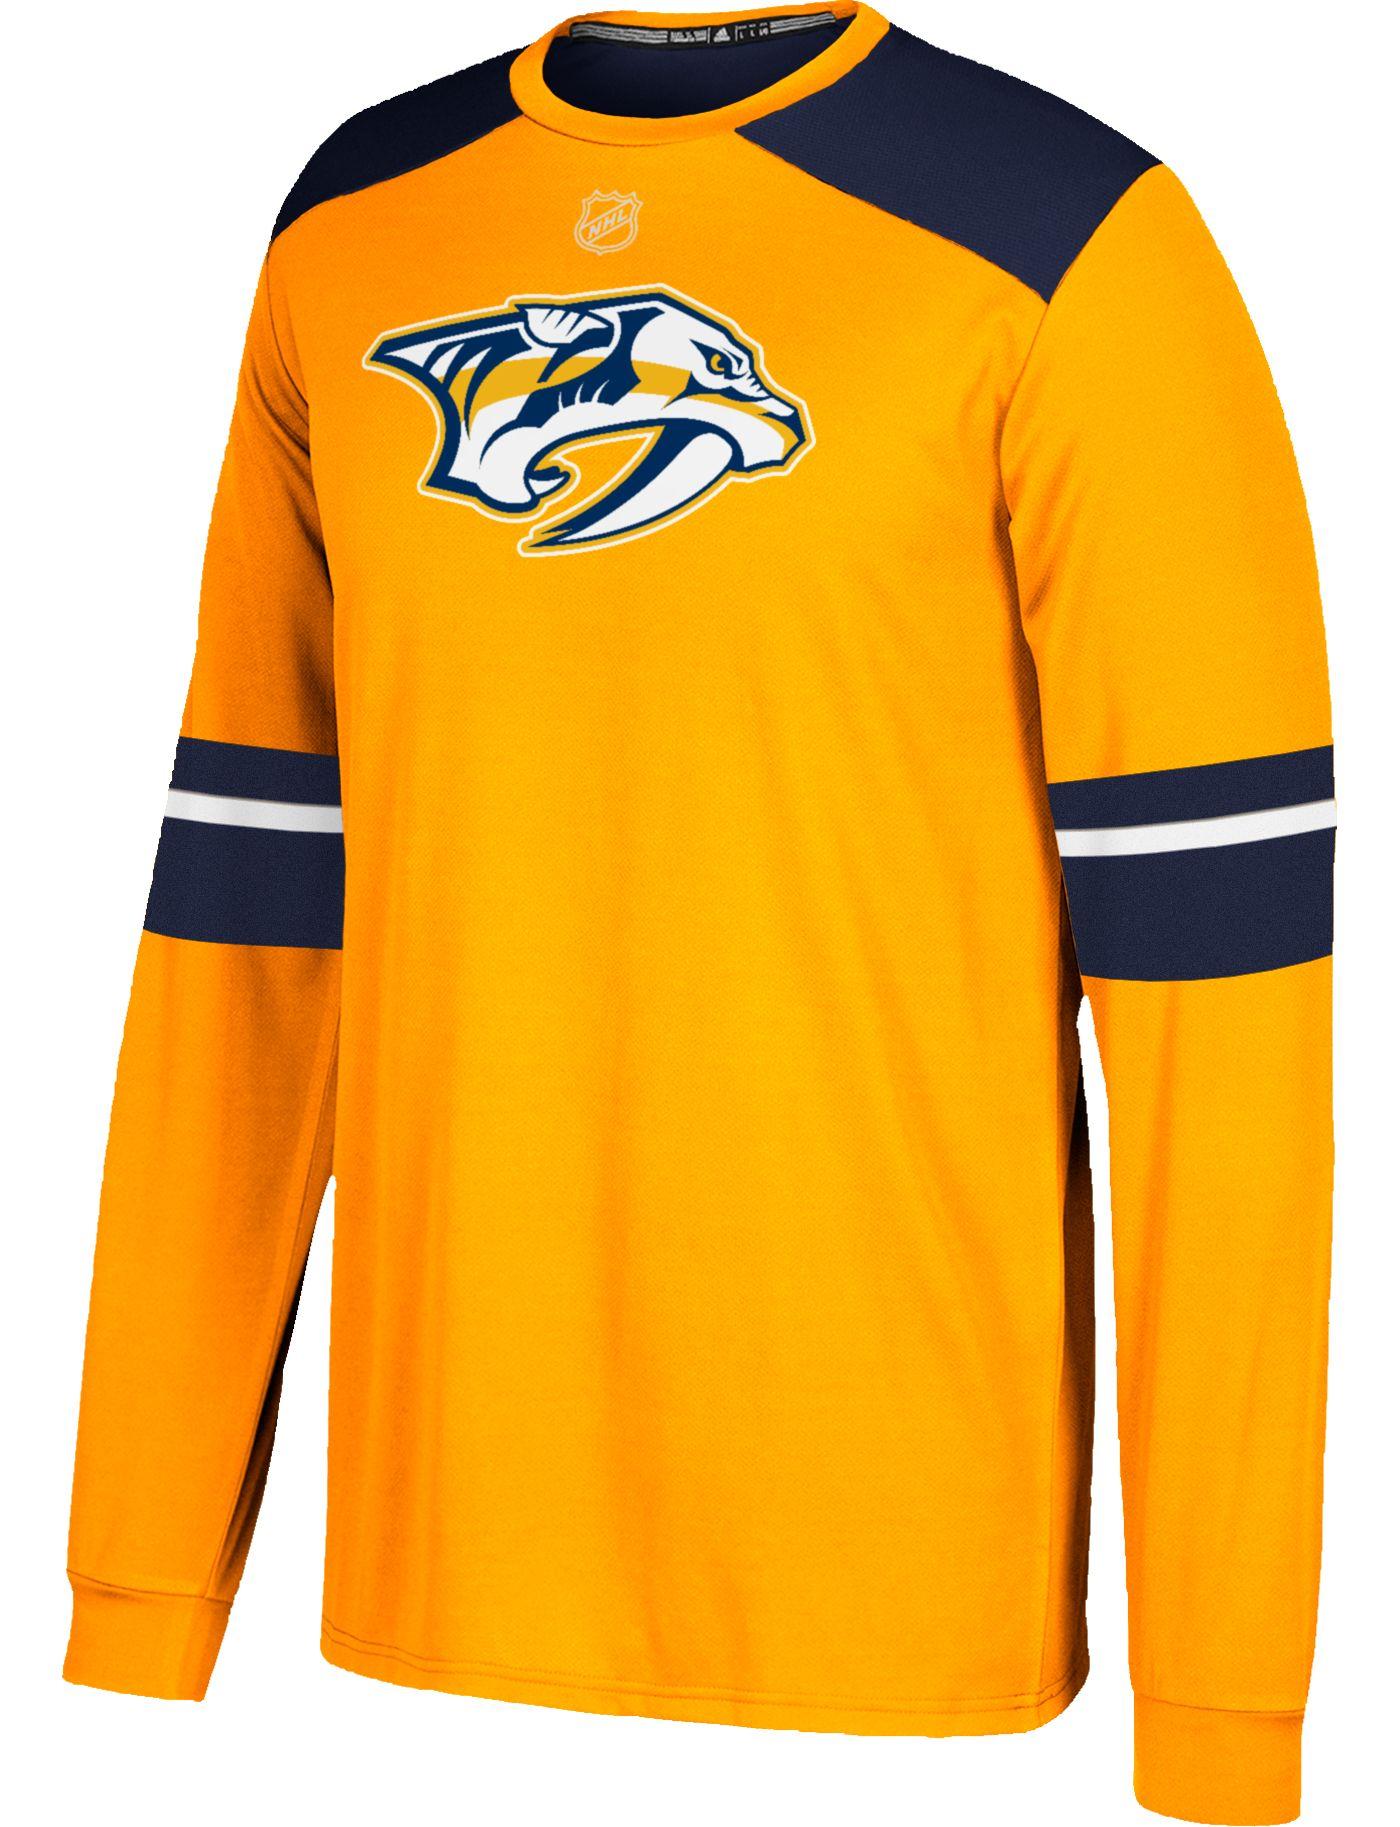 adidas Men's Nashville Predators Jersey Gold Long Sleeve Shirt